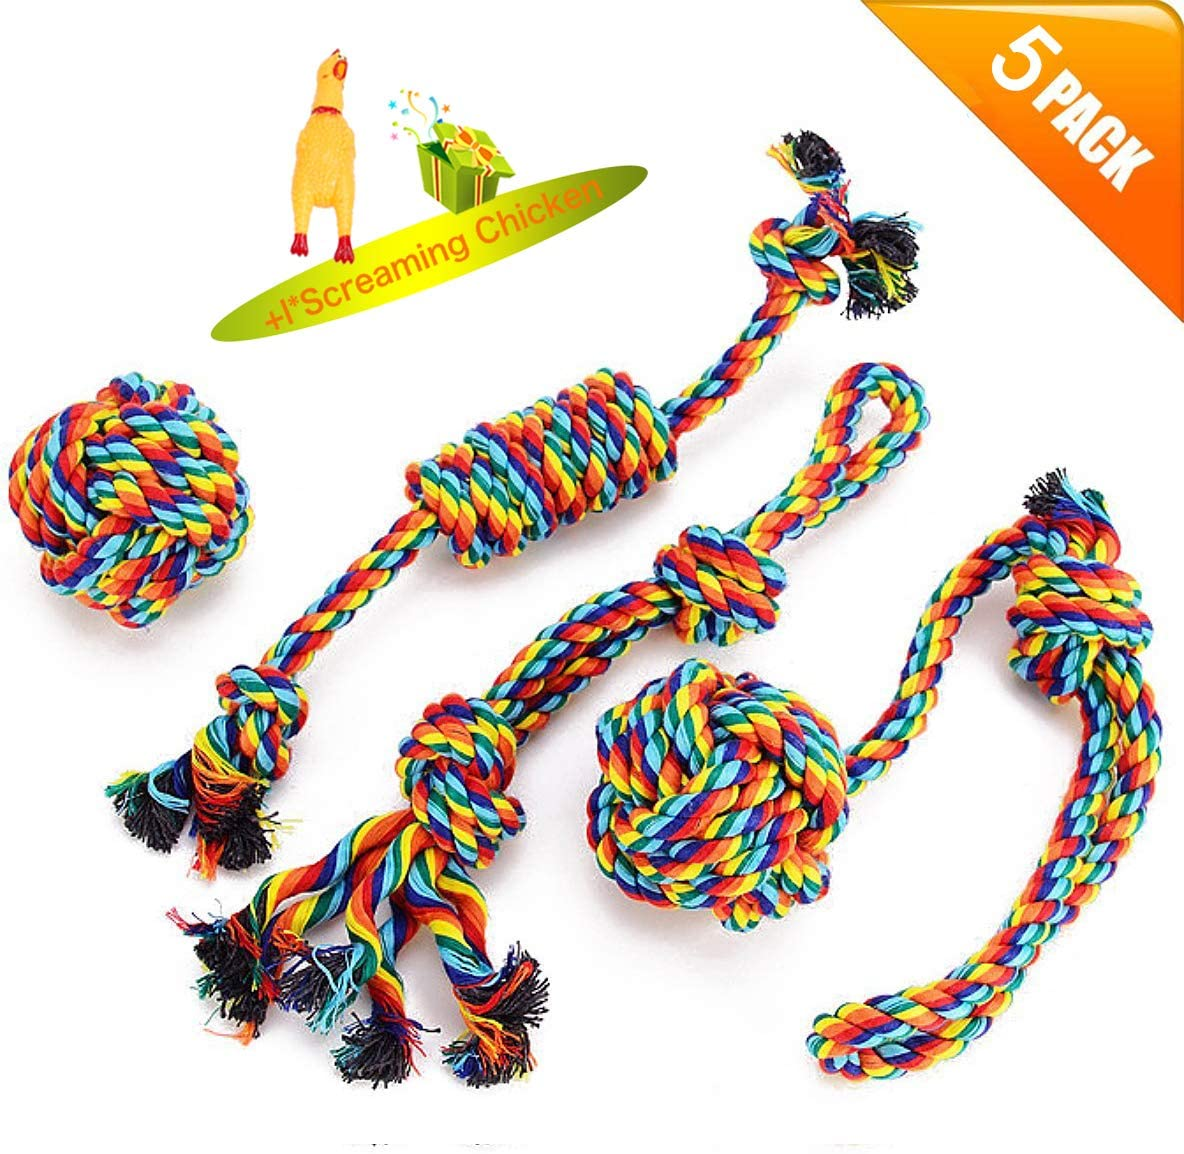 Viewlon Rope Toy Set